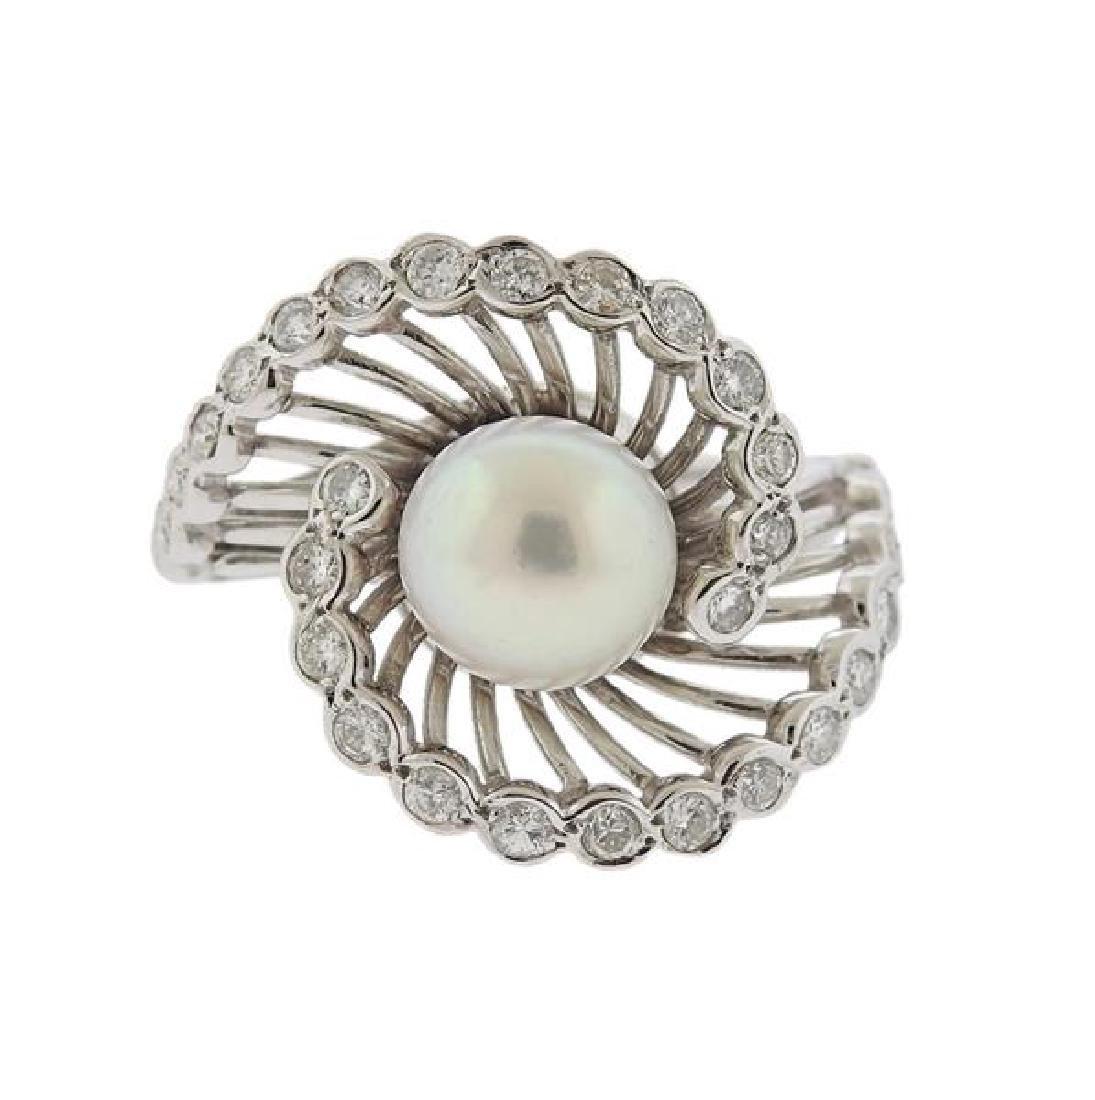 14K Gold Diamond Pearl Swirl Ring